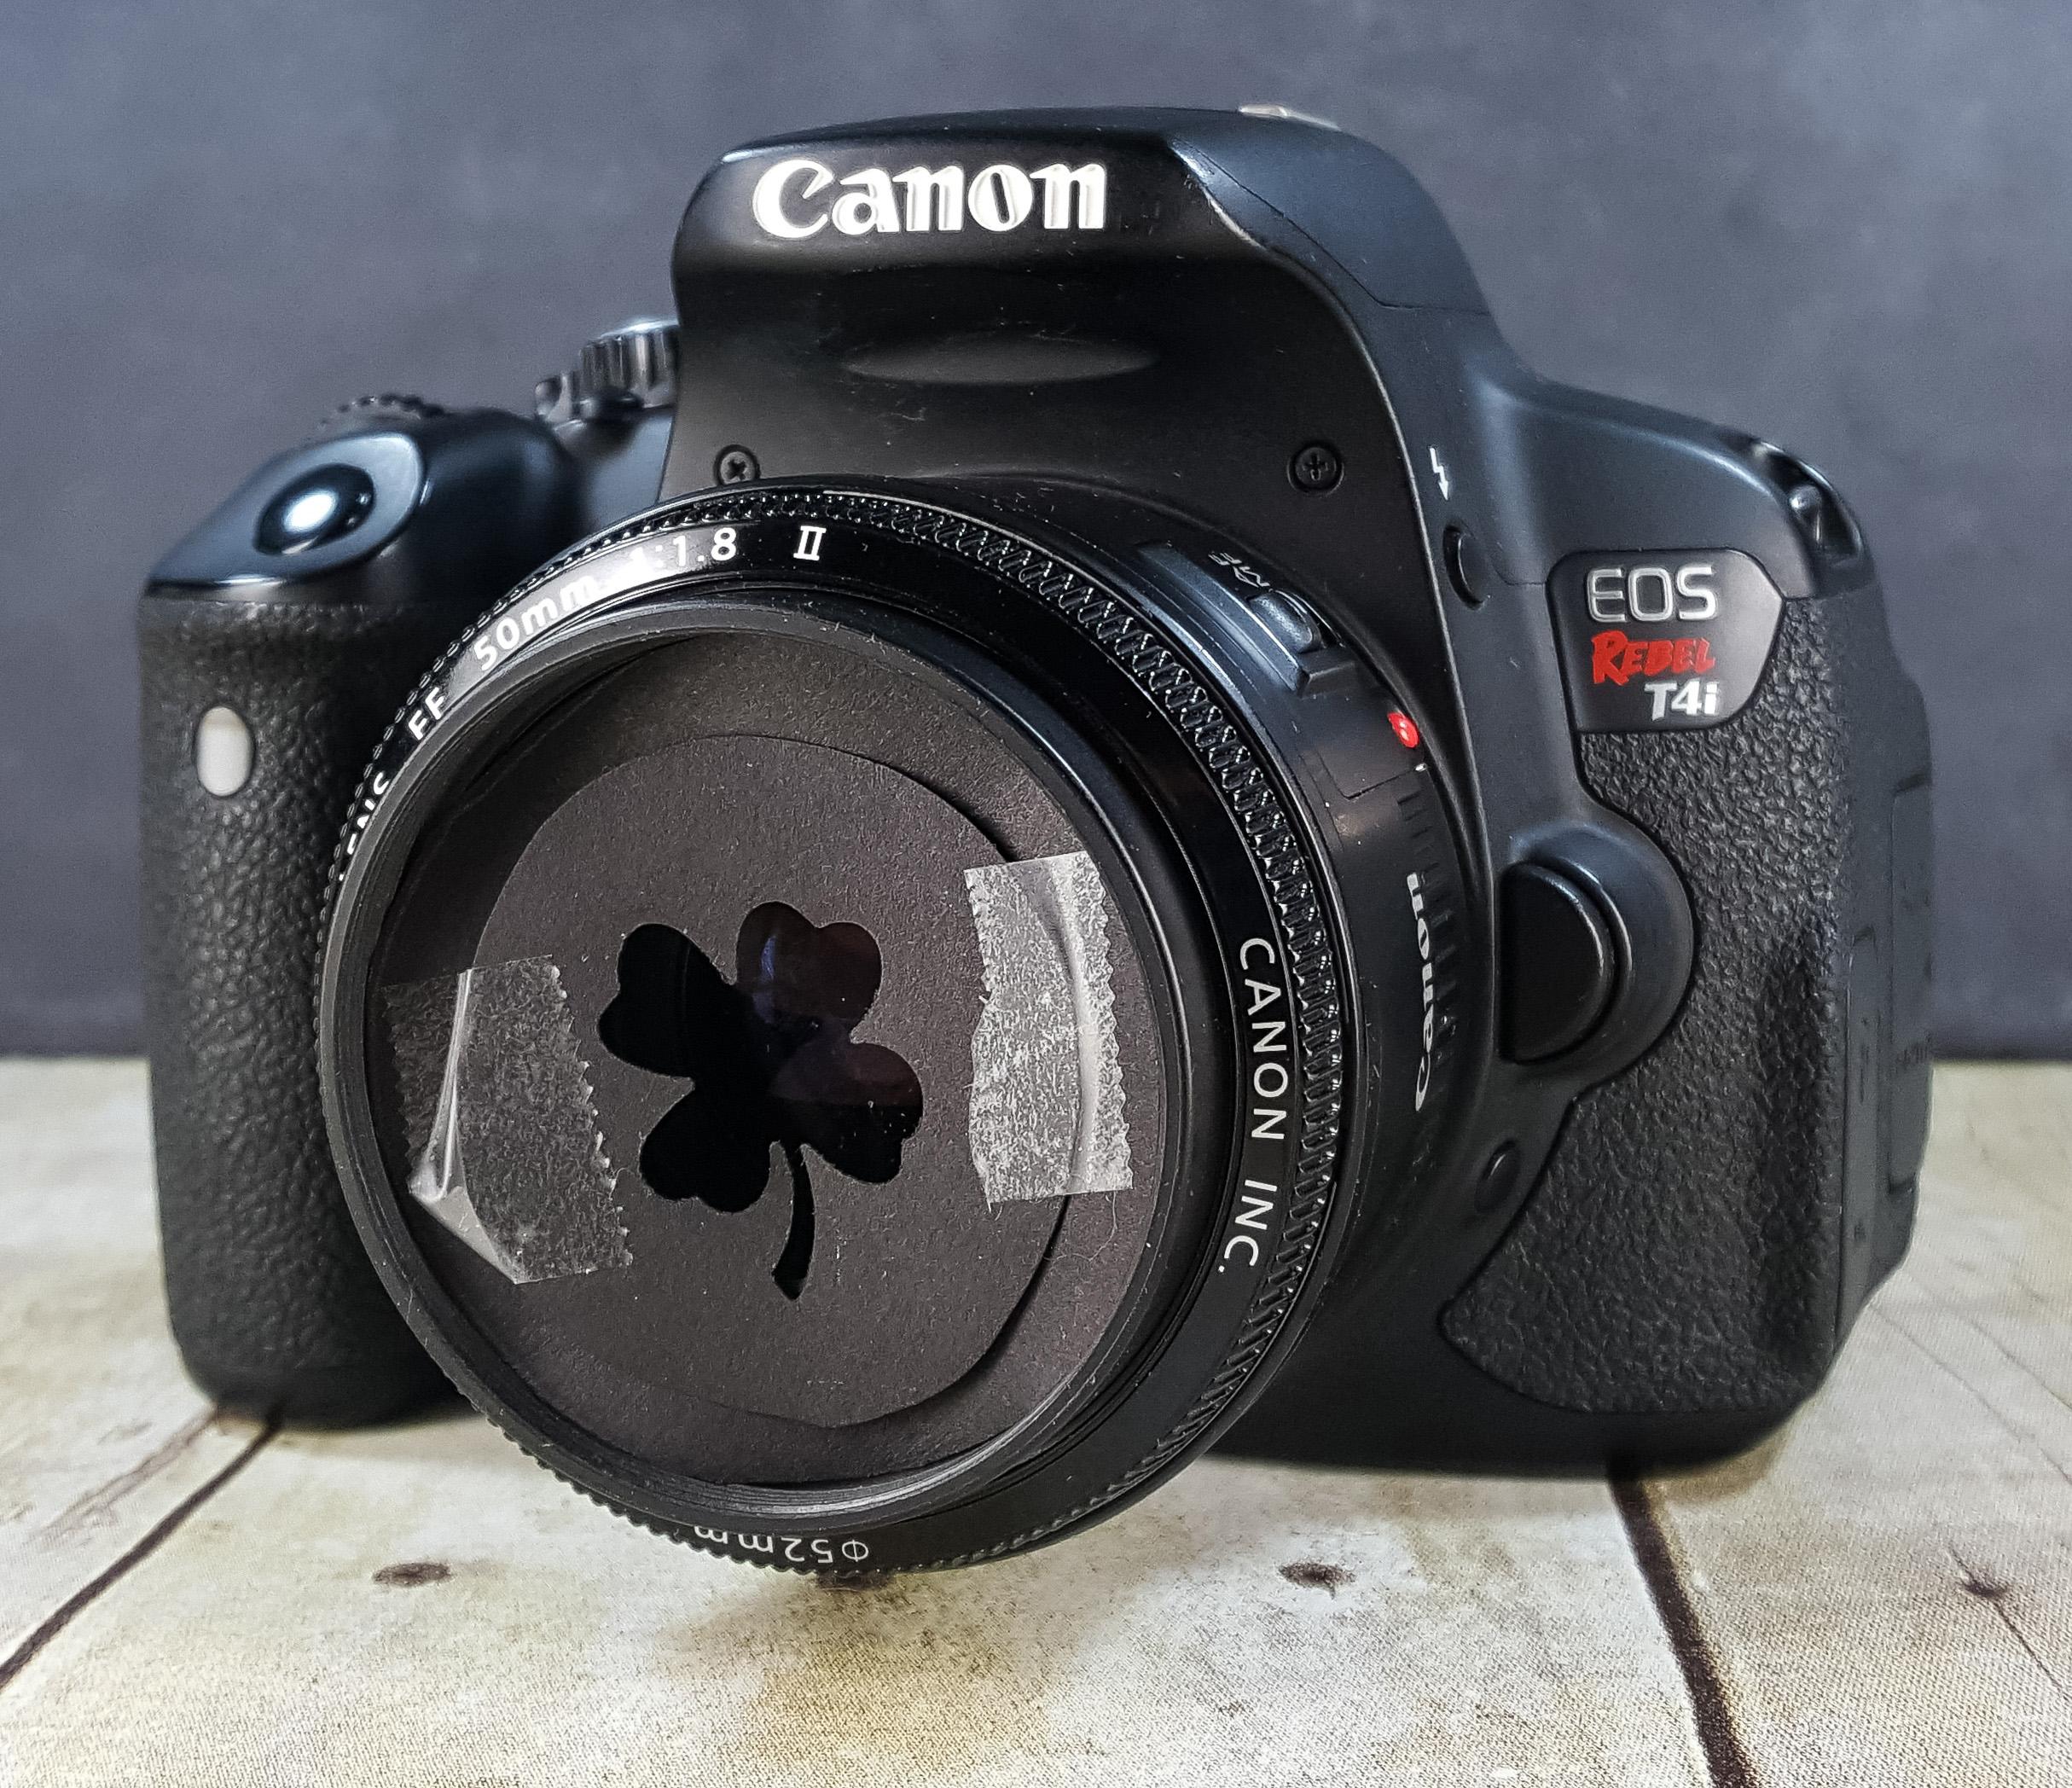 DIY Shamrock Shaped Bokeh Filter on 50mm DSLR Camera Lens | https://www.roseclearfield.com